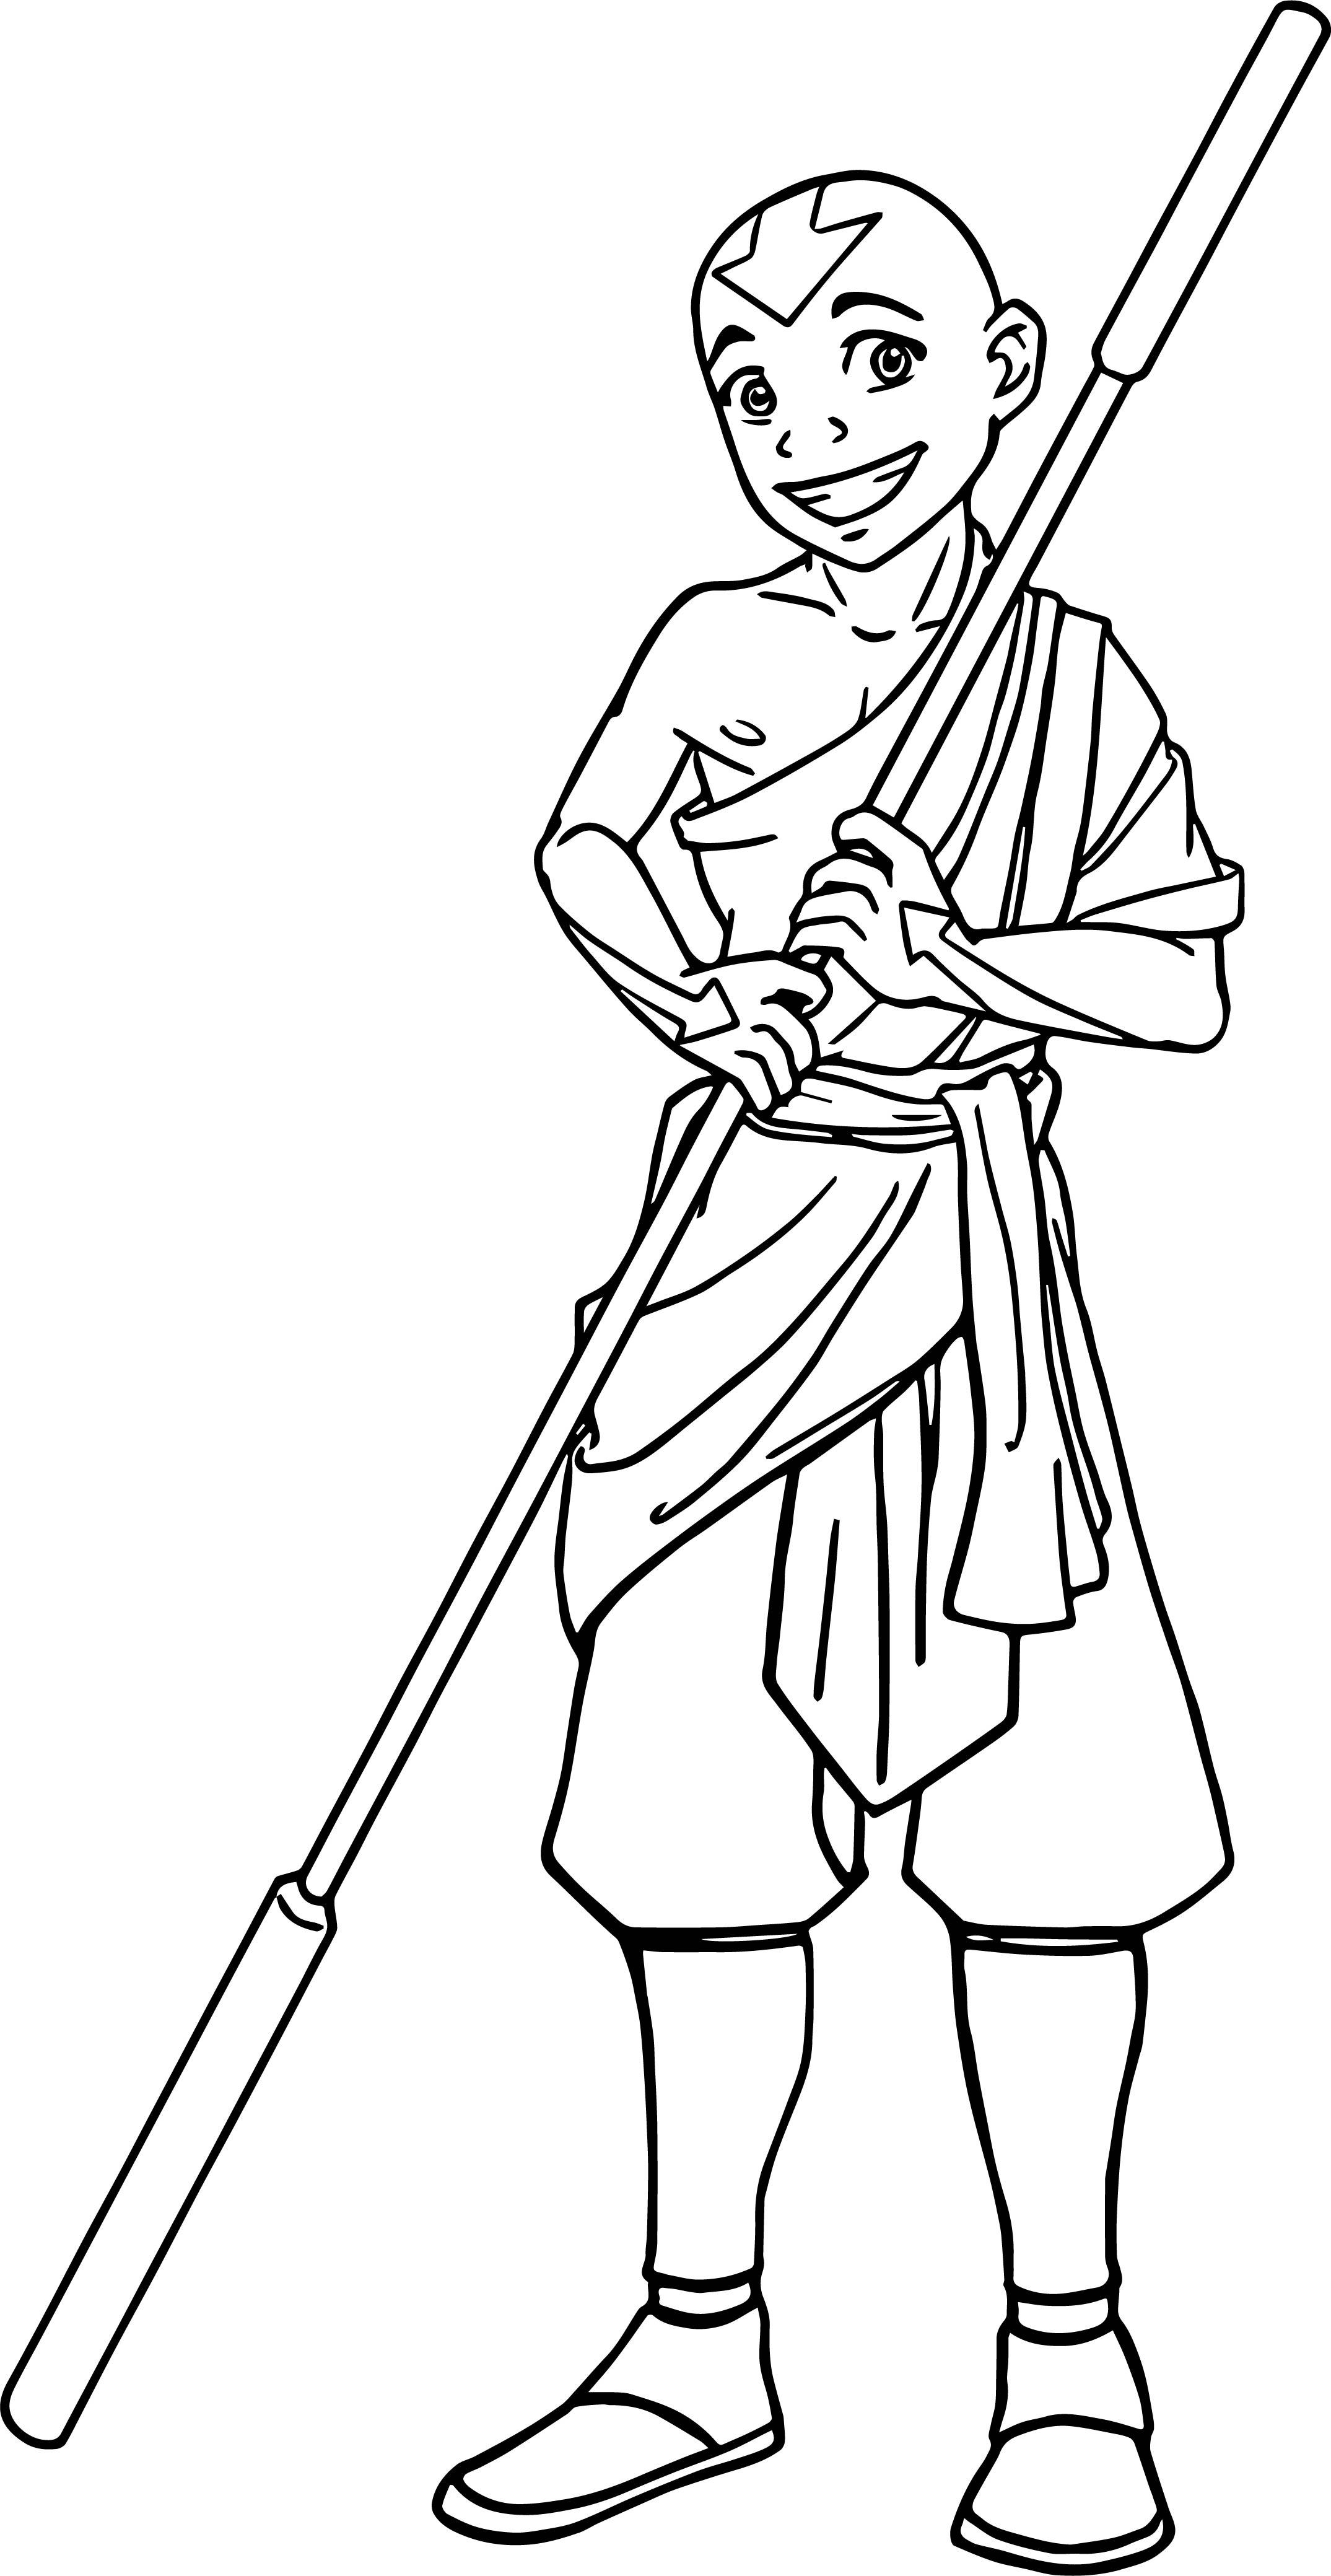 aang commission amiraelizabeth dsnou avatar aang coloring